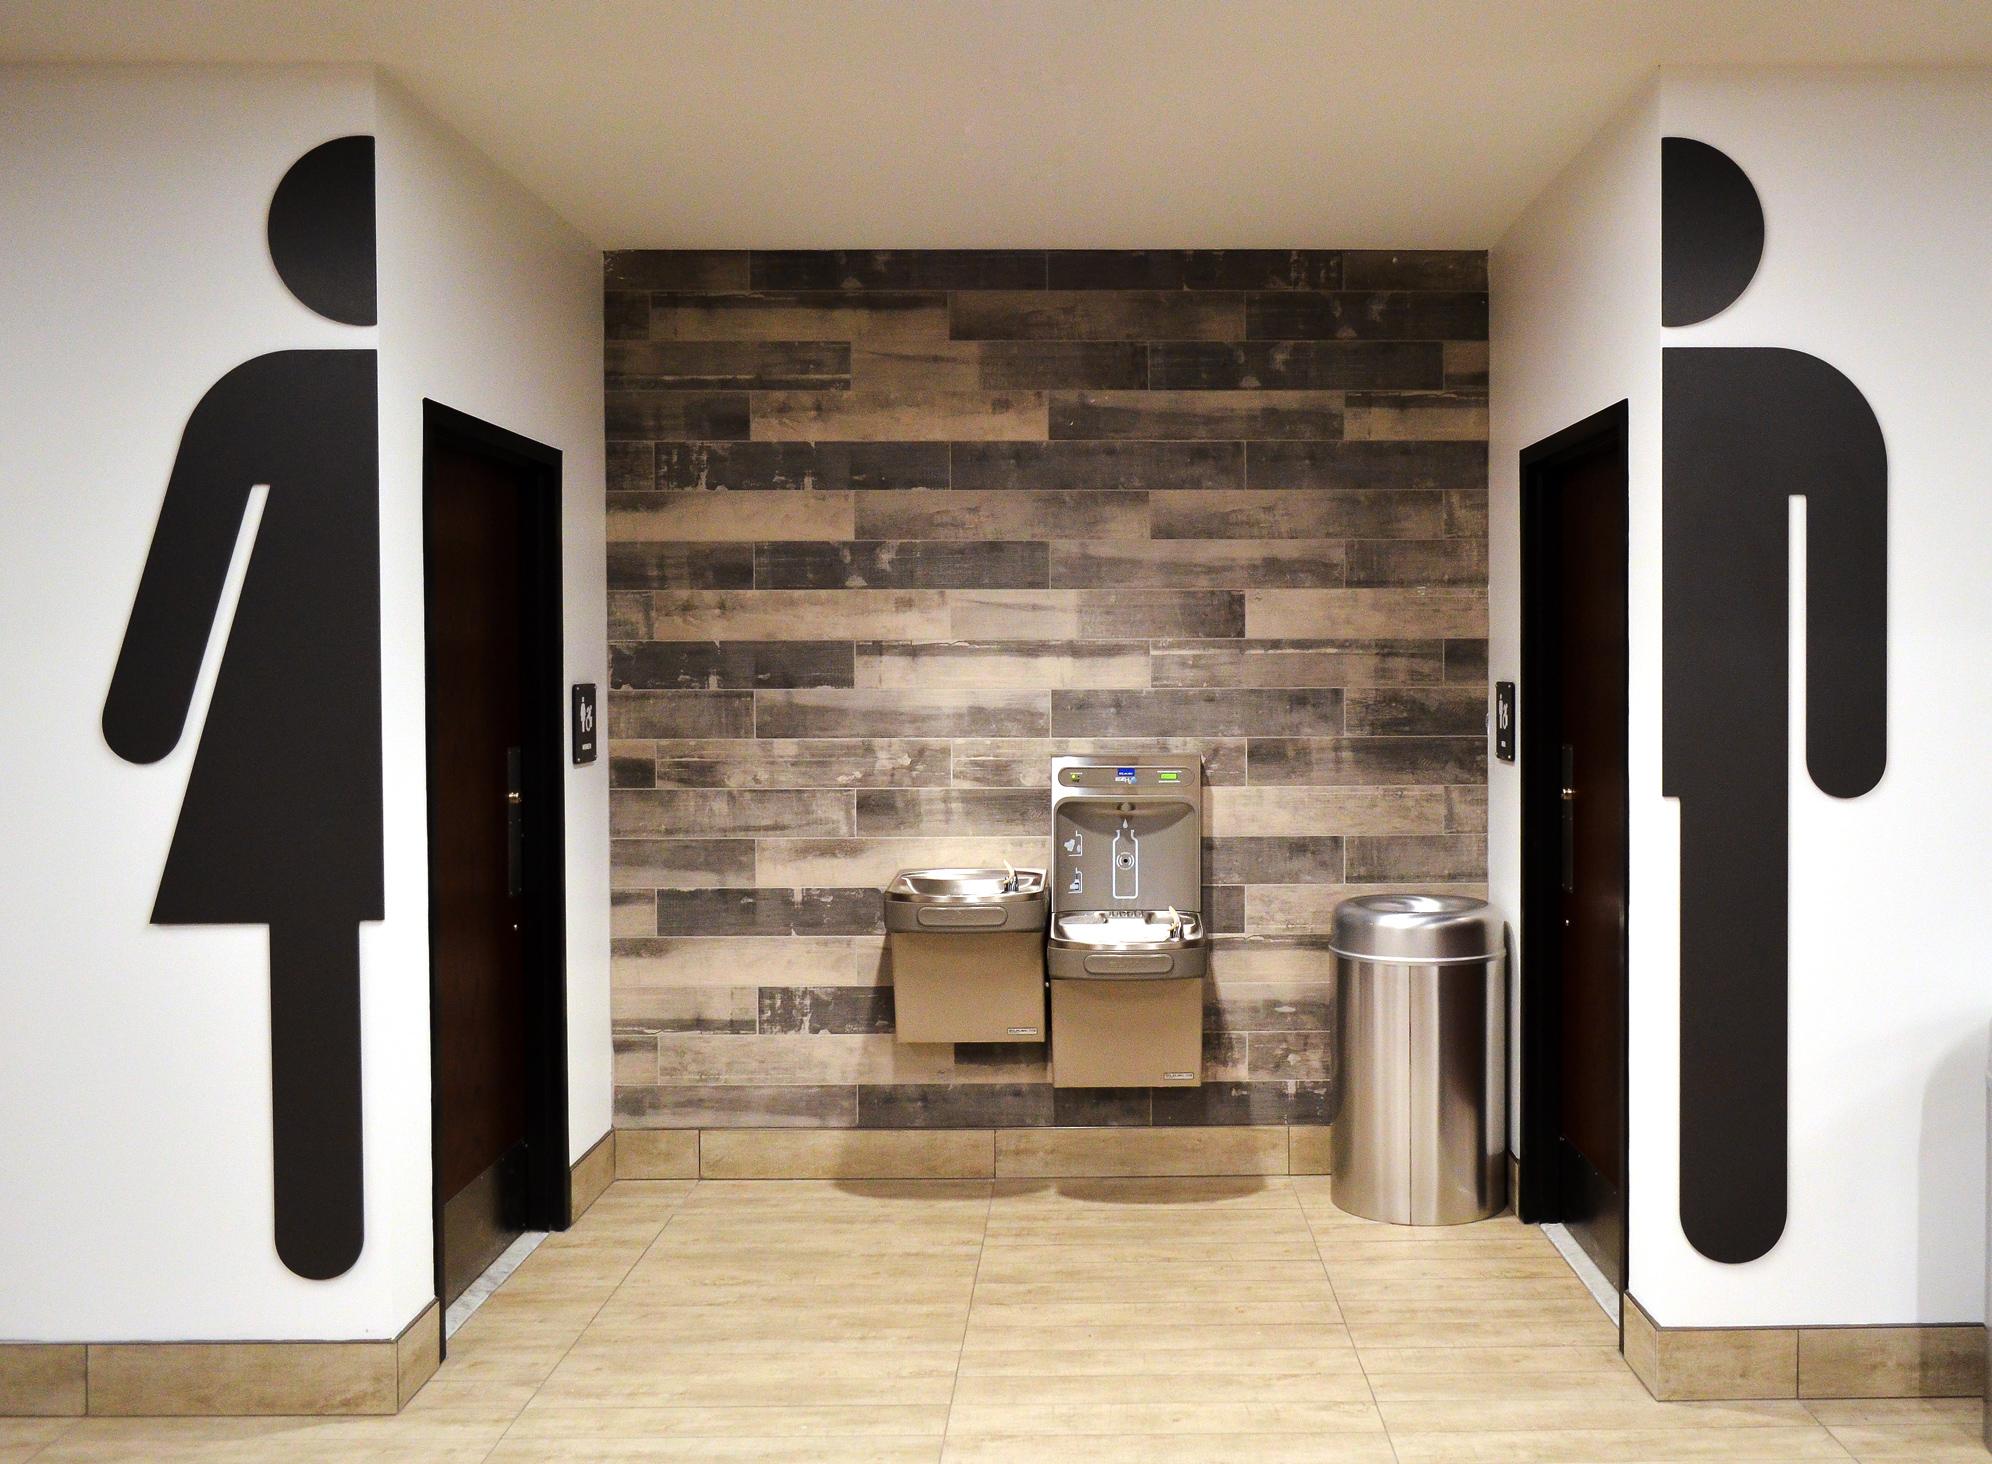 Moxie restroom graphics at YMCA